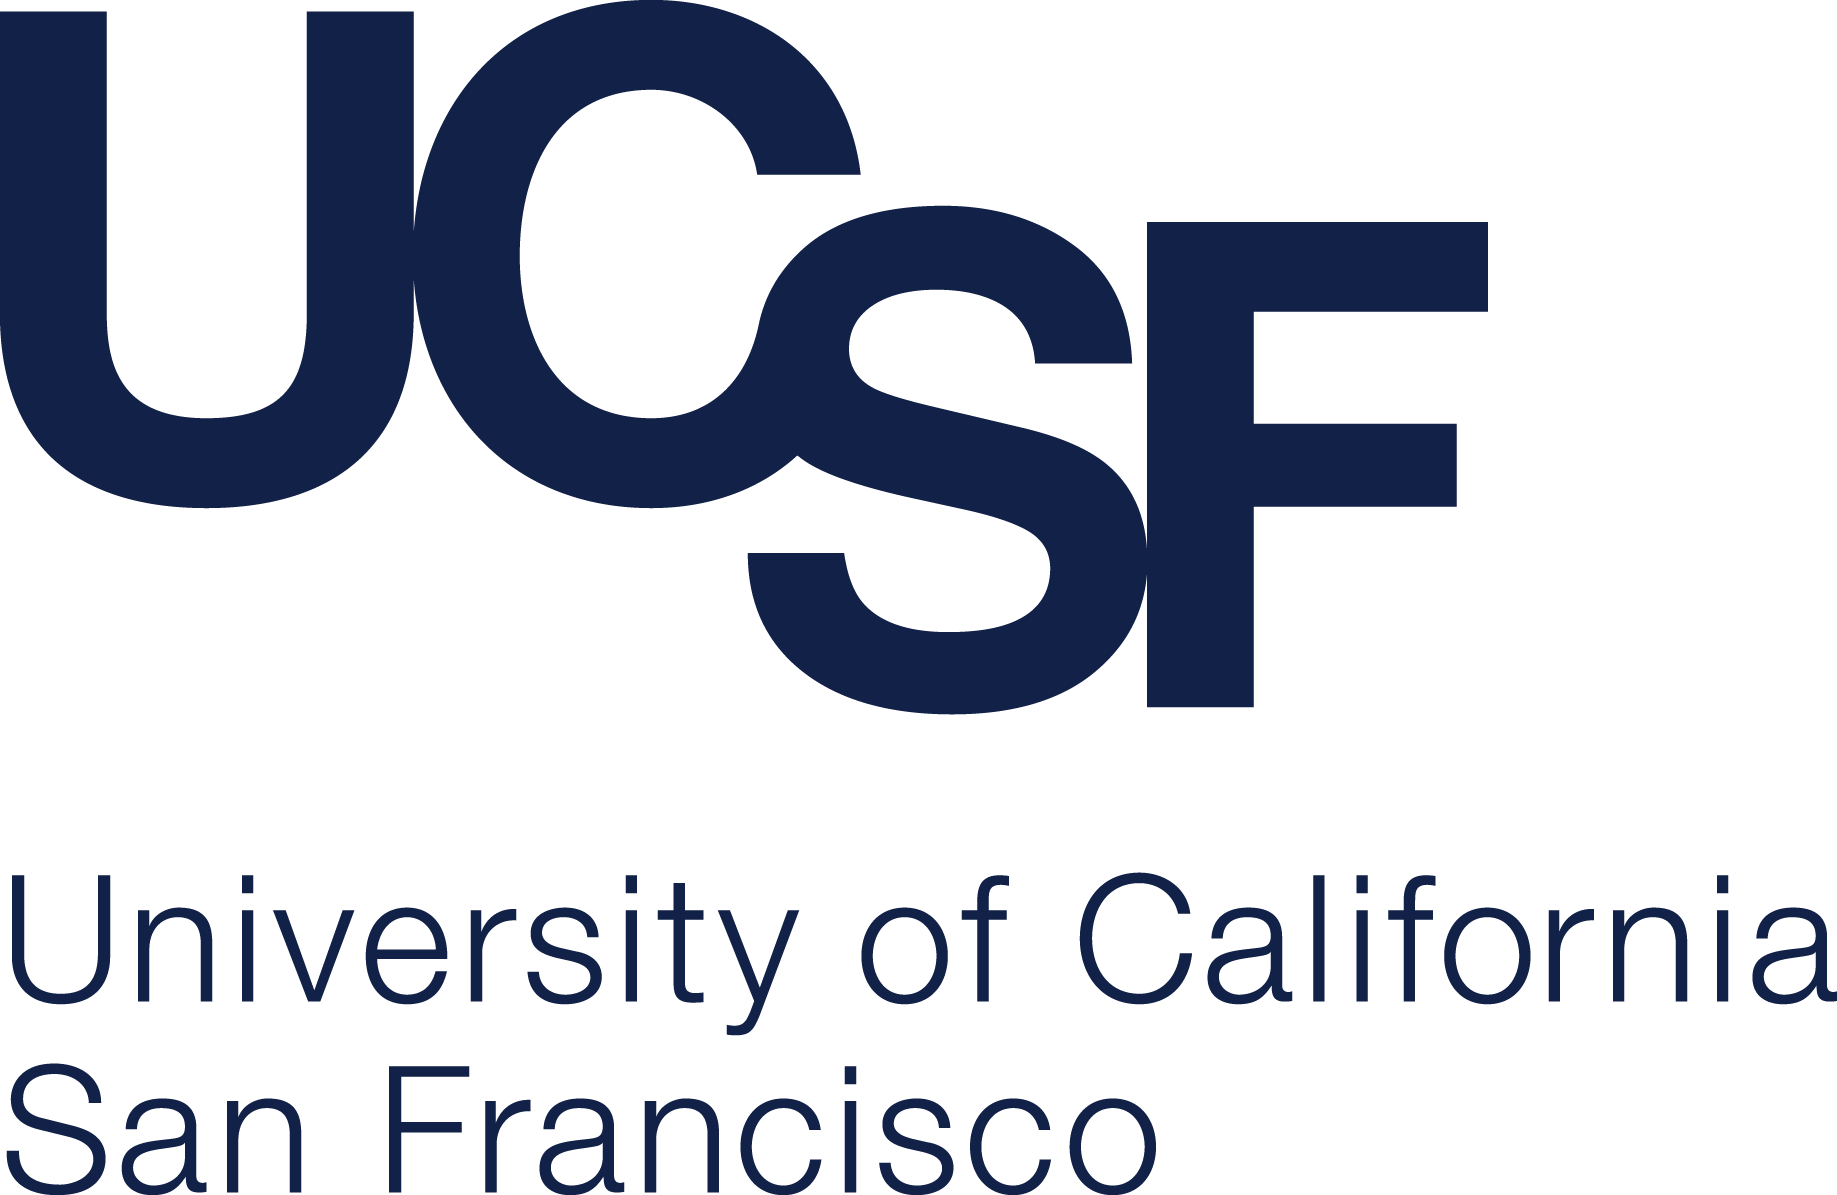 UCSF Logo – University of California, San Francisco | University logo,  University of california, University